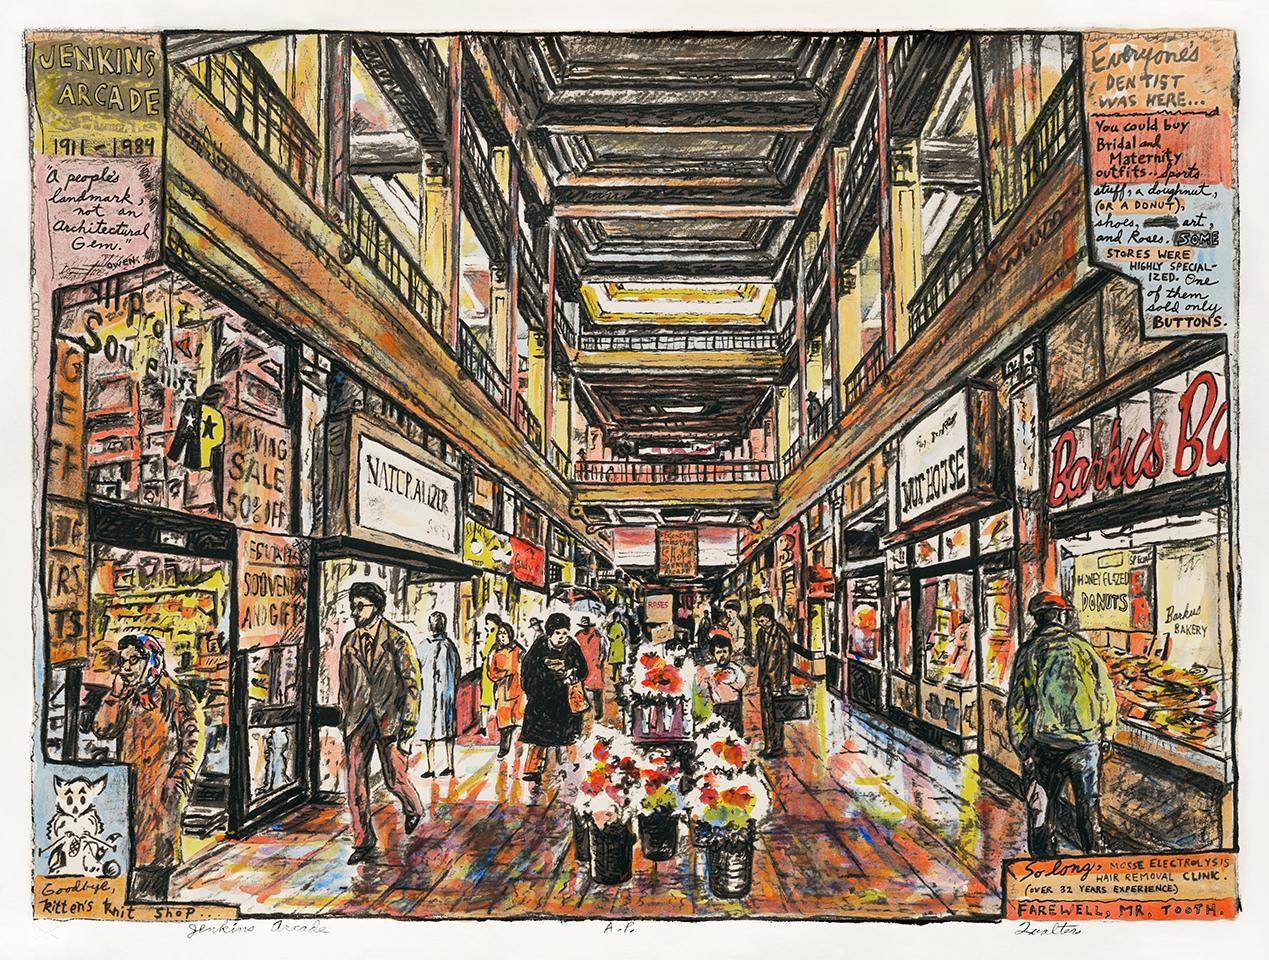 Jenkins Arcade